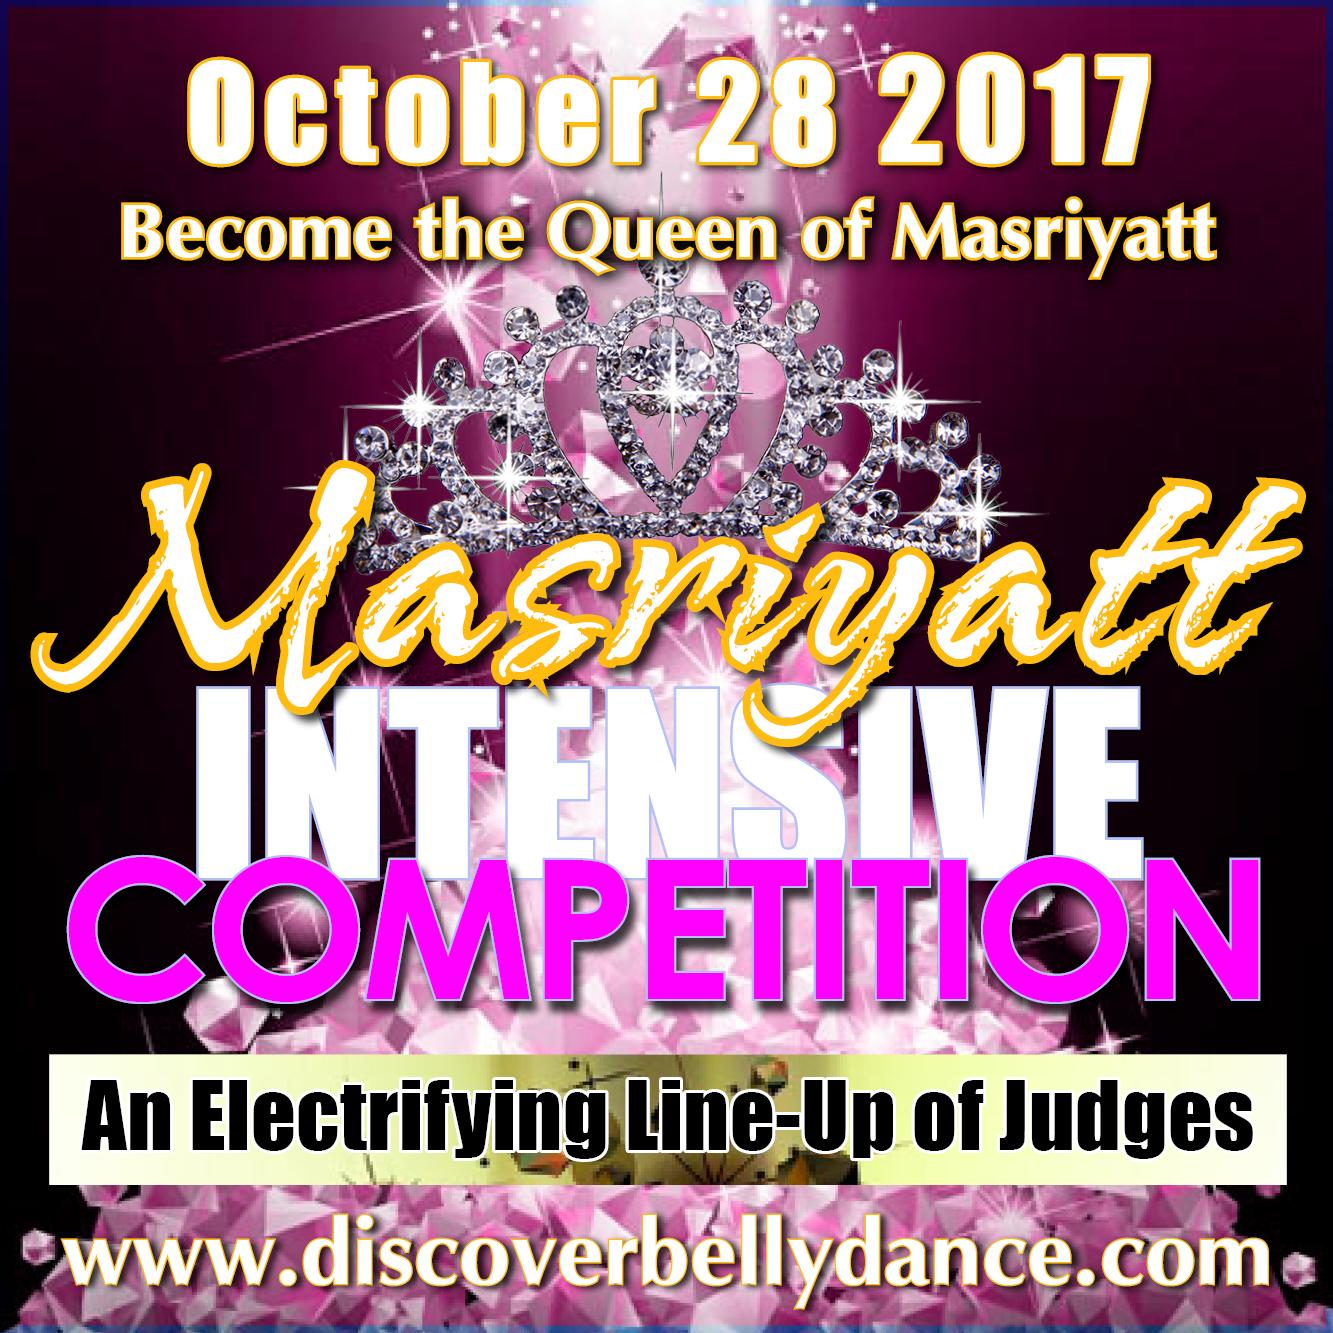 Masriyatt 2017 Competition